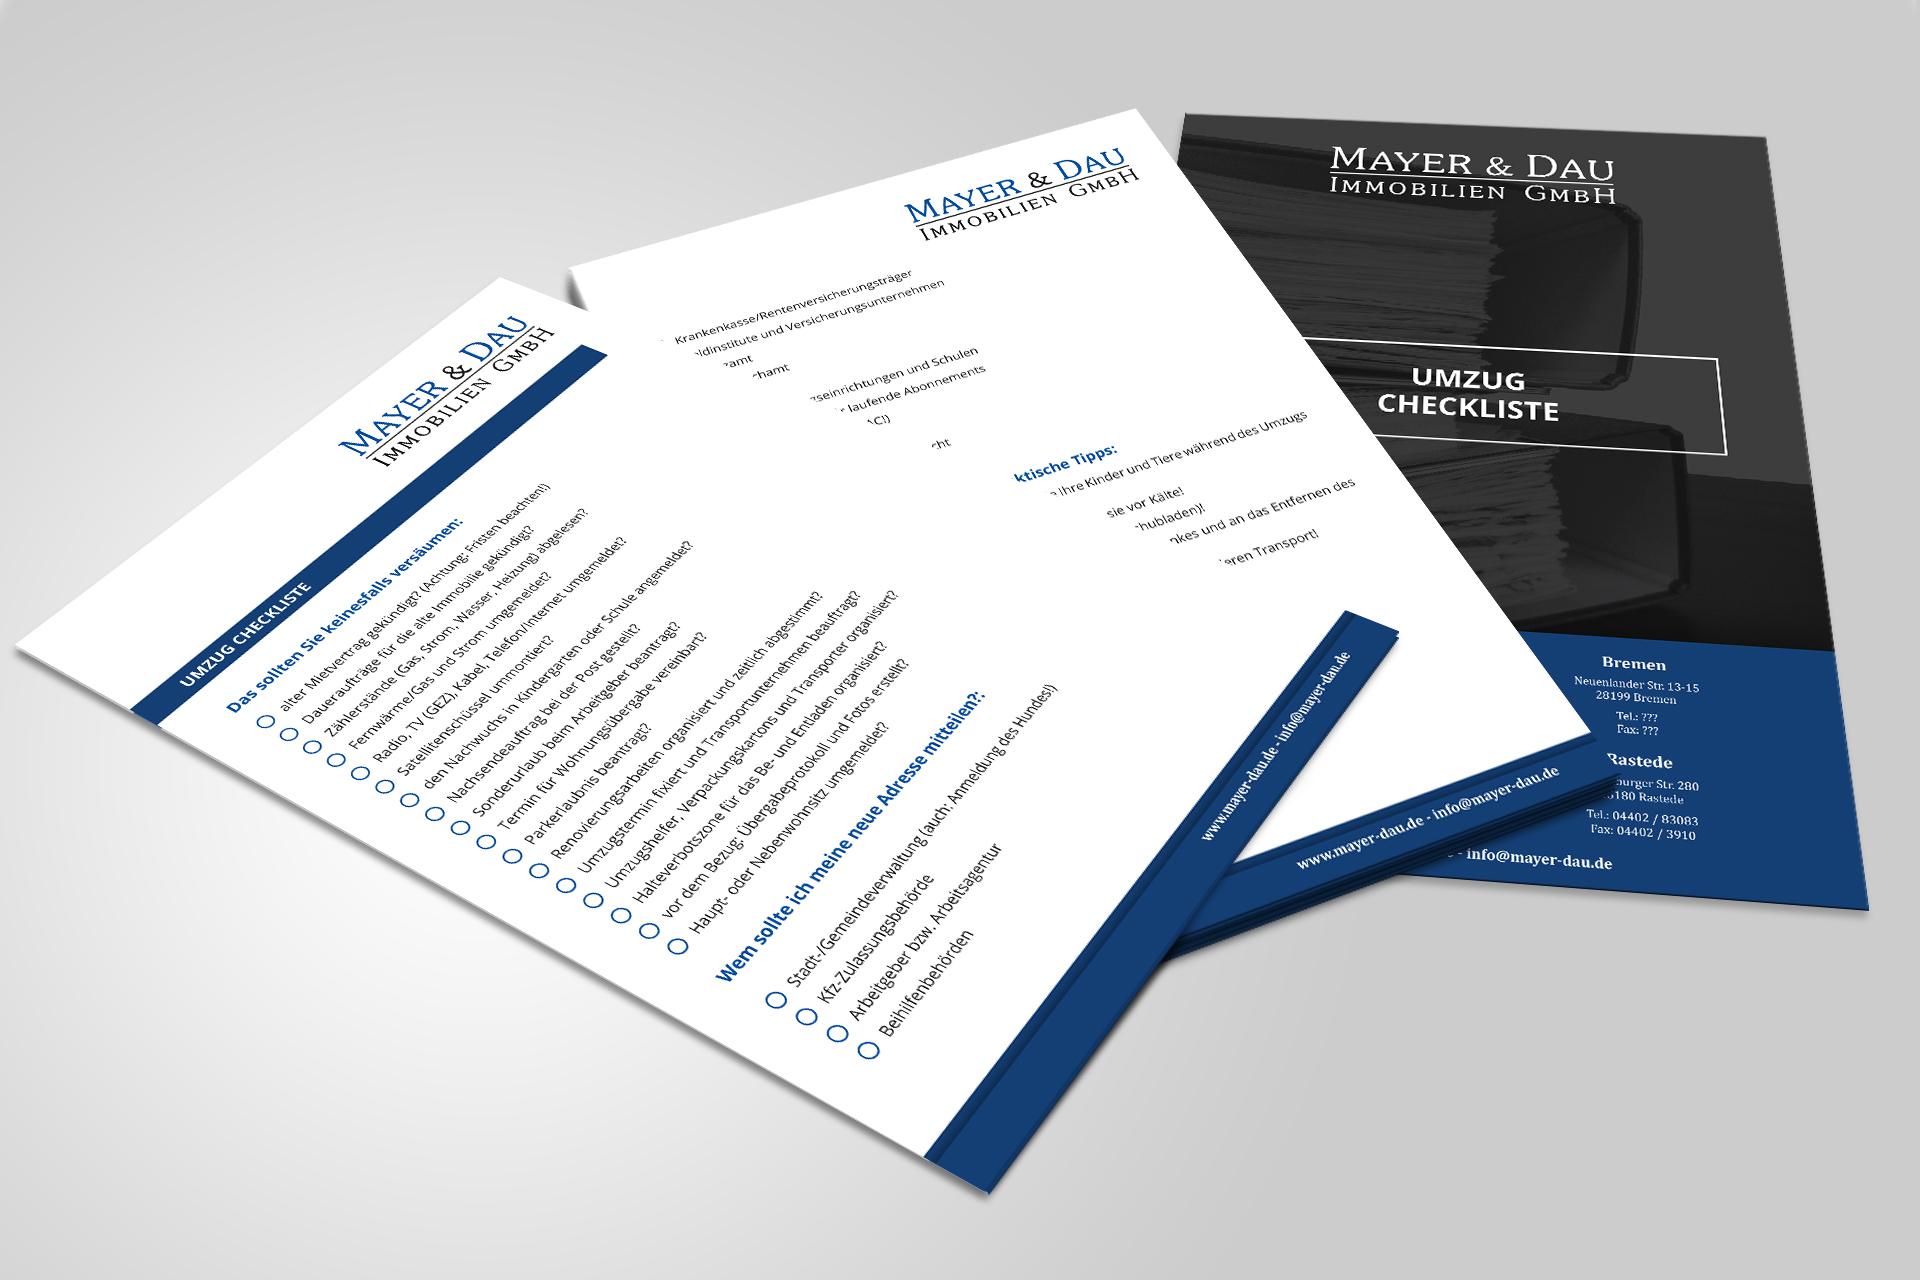 M&D_Umzug_Checkliste